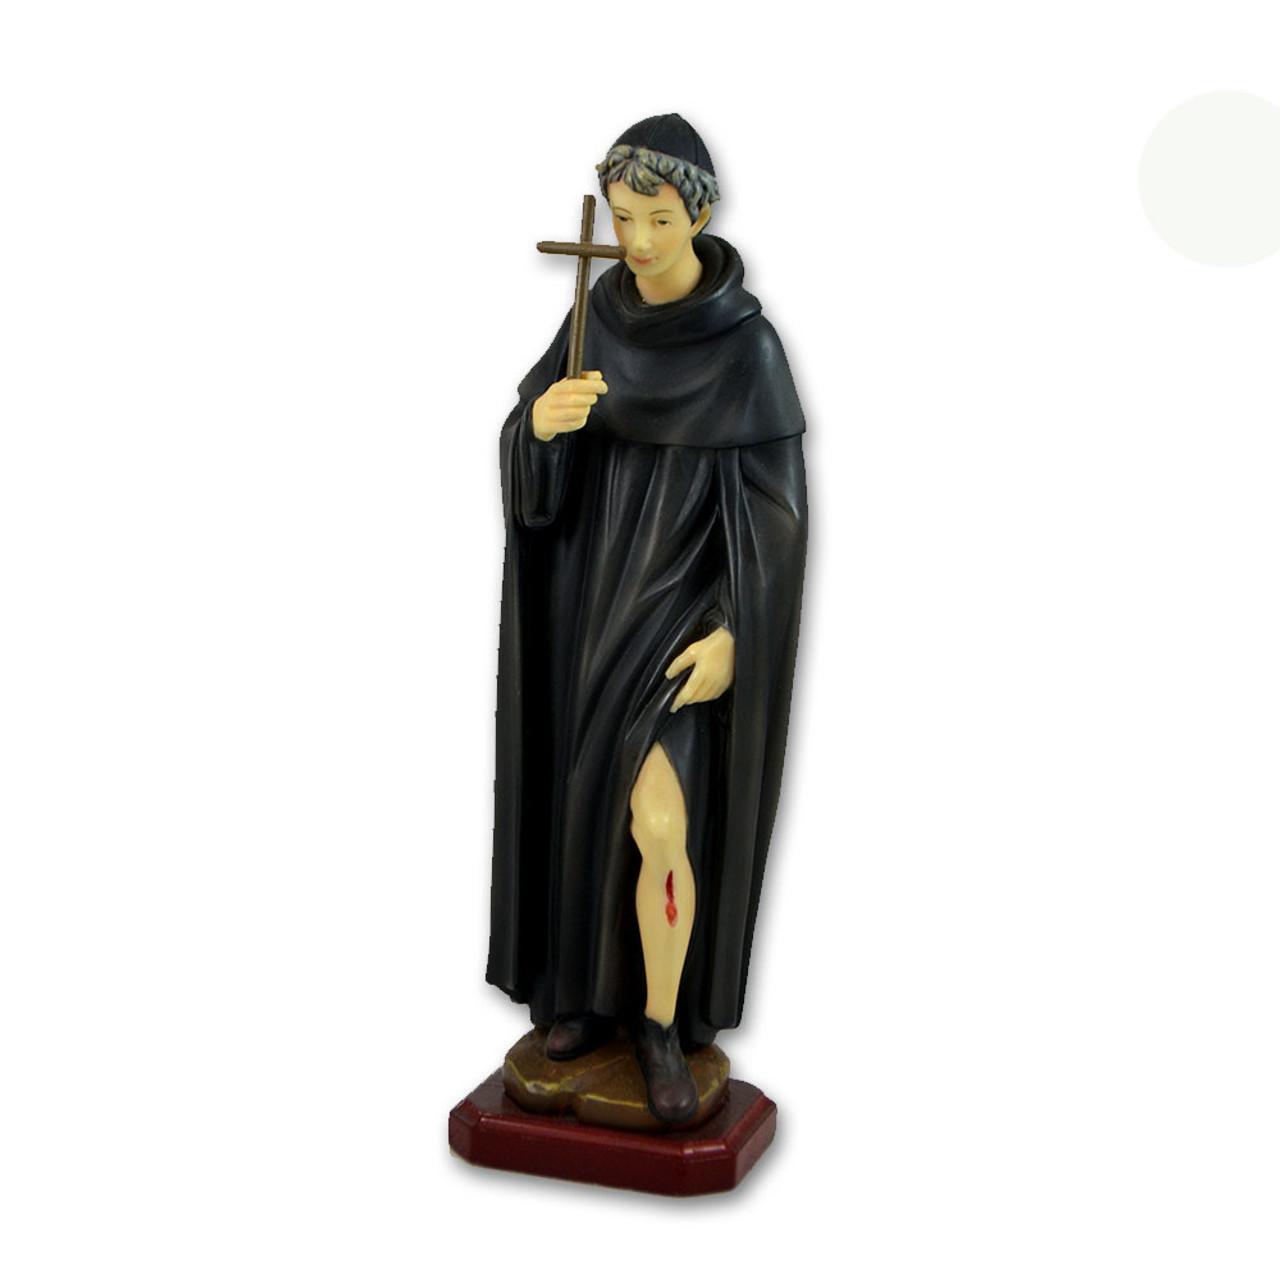 St Peregrine Classico Statue 8IN